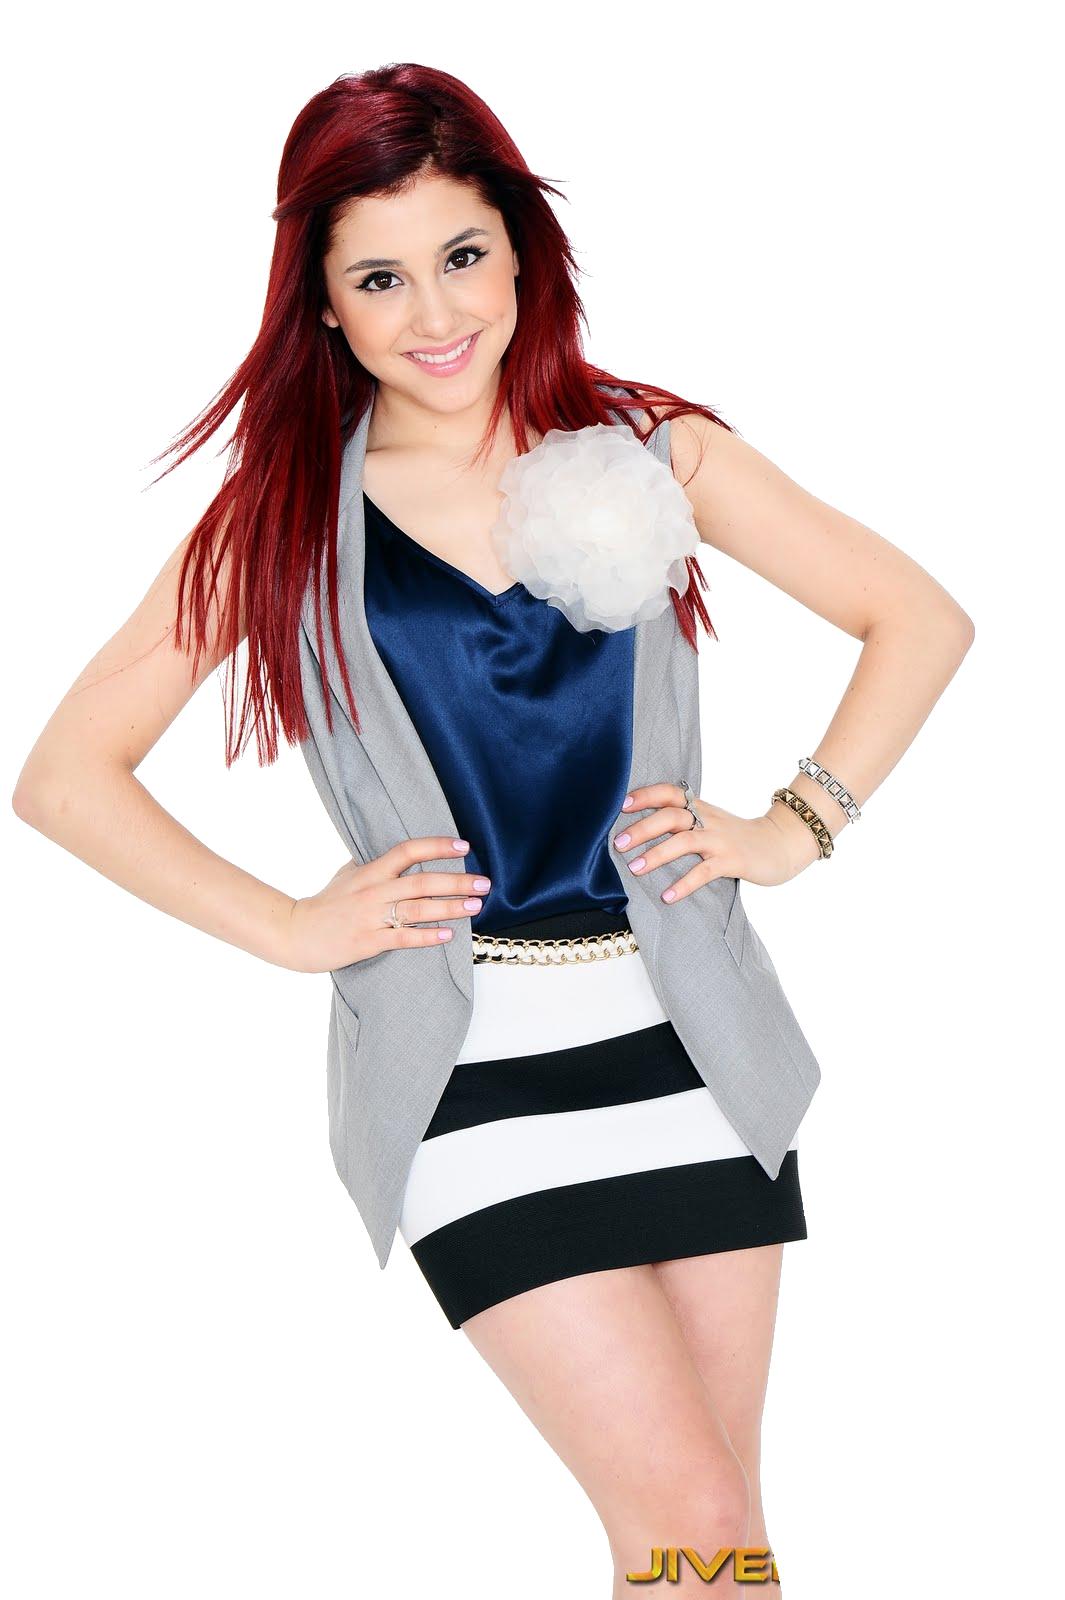 Ariana grande png by diannaagron-d4flj4x.png - Women HD PNG